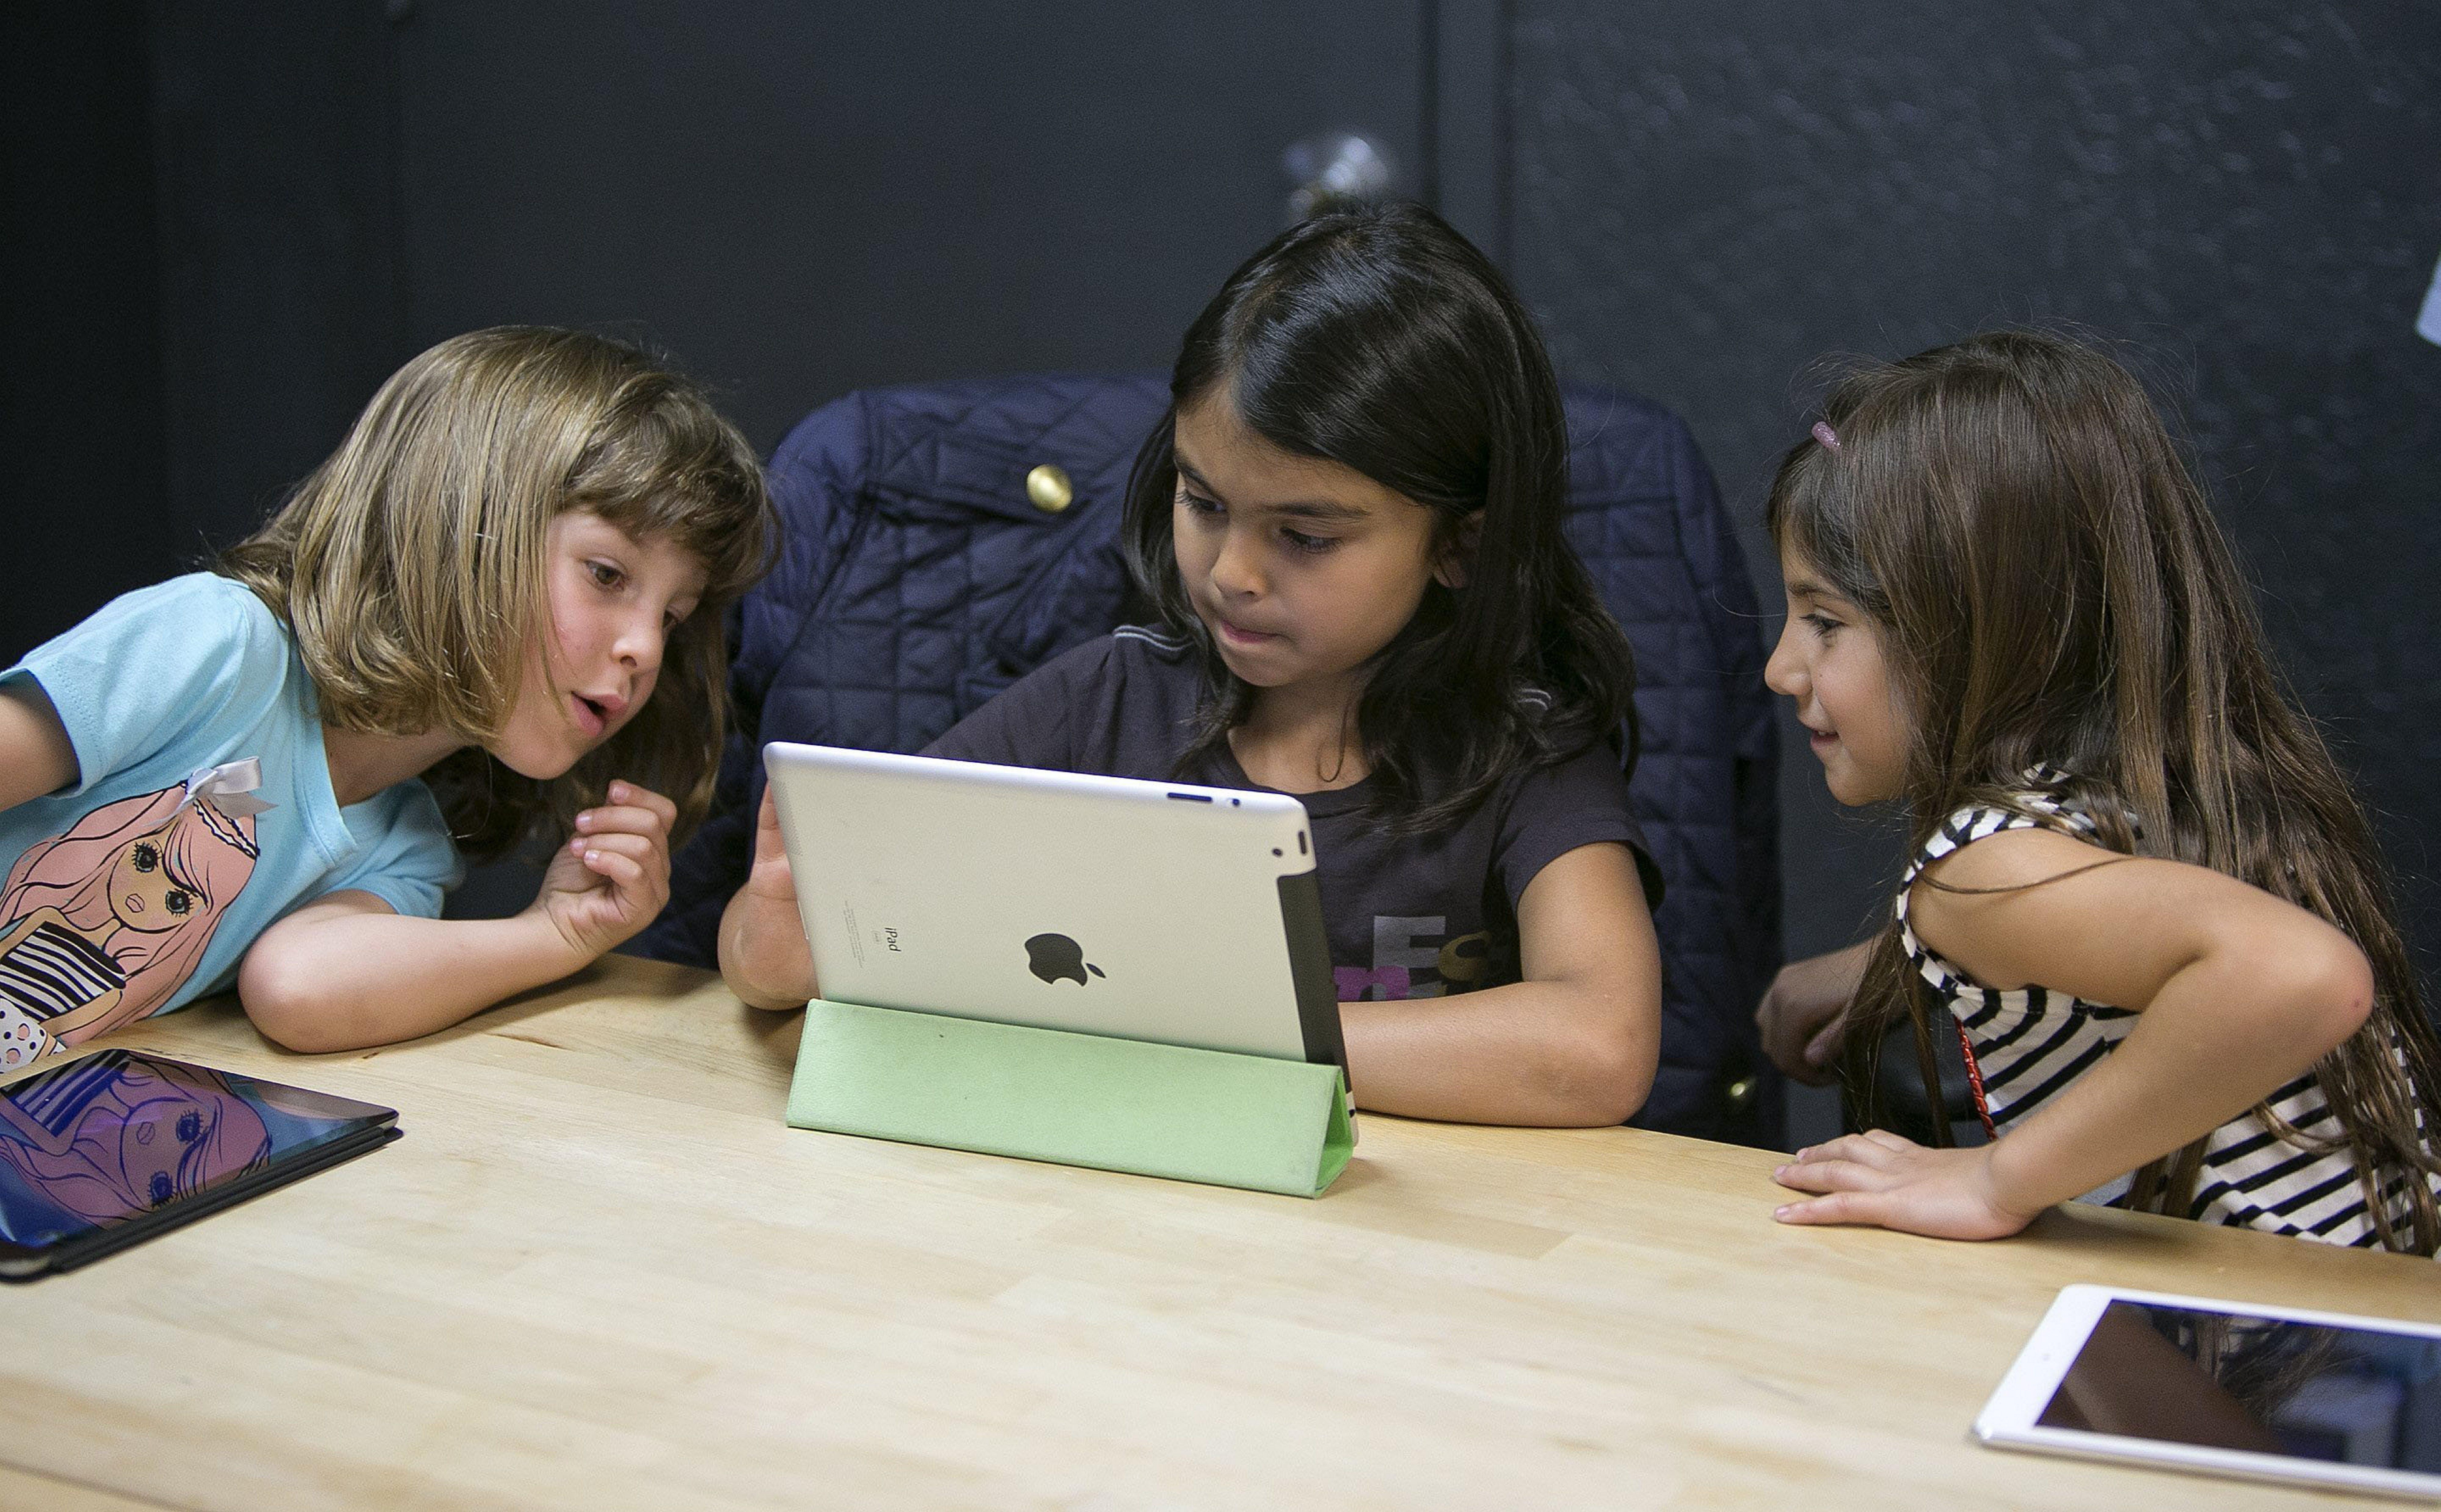 Anna Heath, 5, from left, Aryka Gunsagar, 6, and Rayah Ghosheh, 6, test Kidaptive's Leo's Pad app at the Kidaptive office in Palo Alto, Calif.